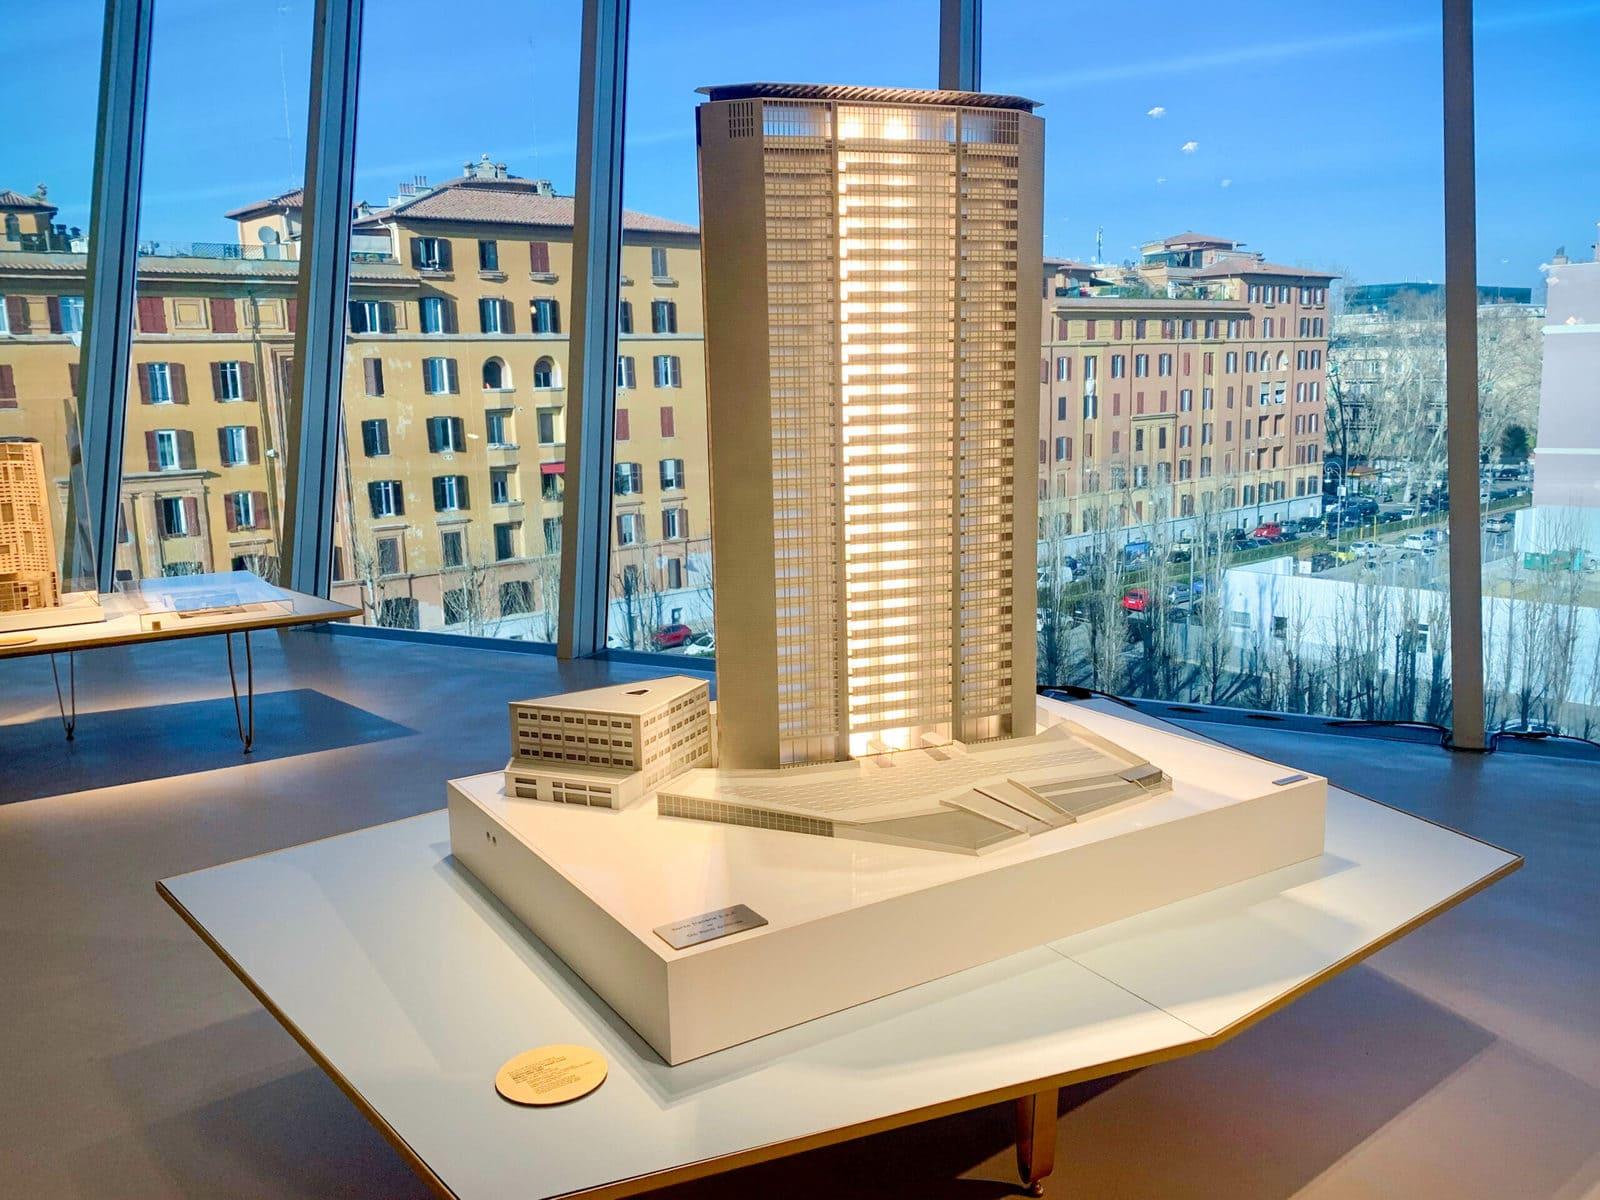 MAXXI Rom Gio Ponti Ausstellung, Grattacielo Pirelli / Pirelli Tower Milano 1956-1960, Rom